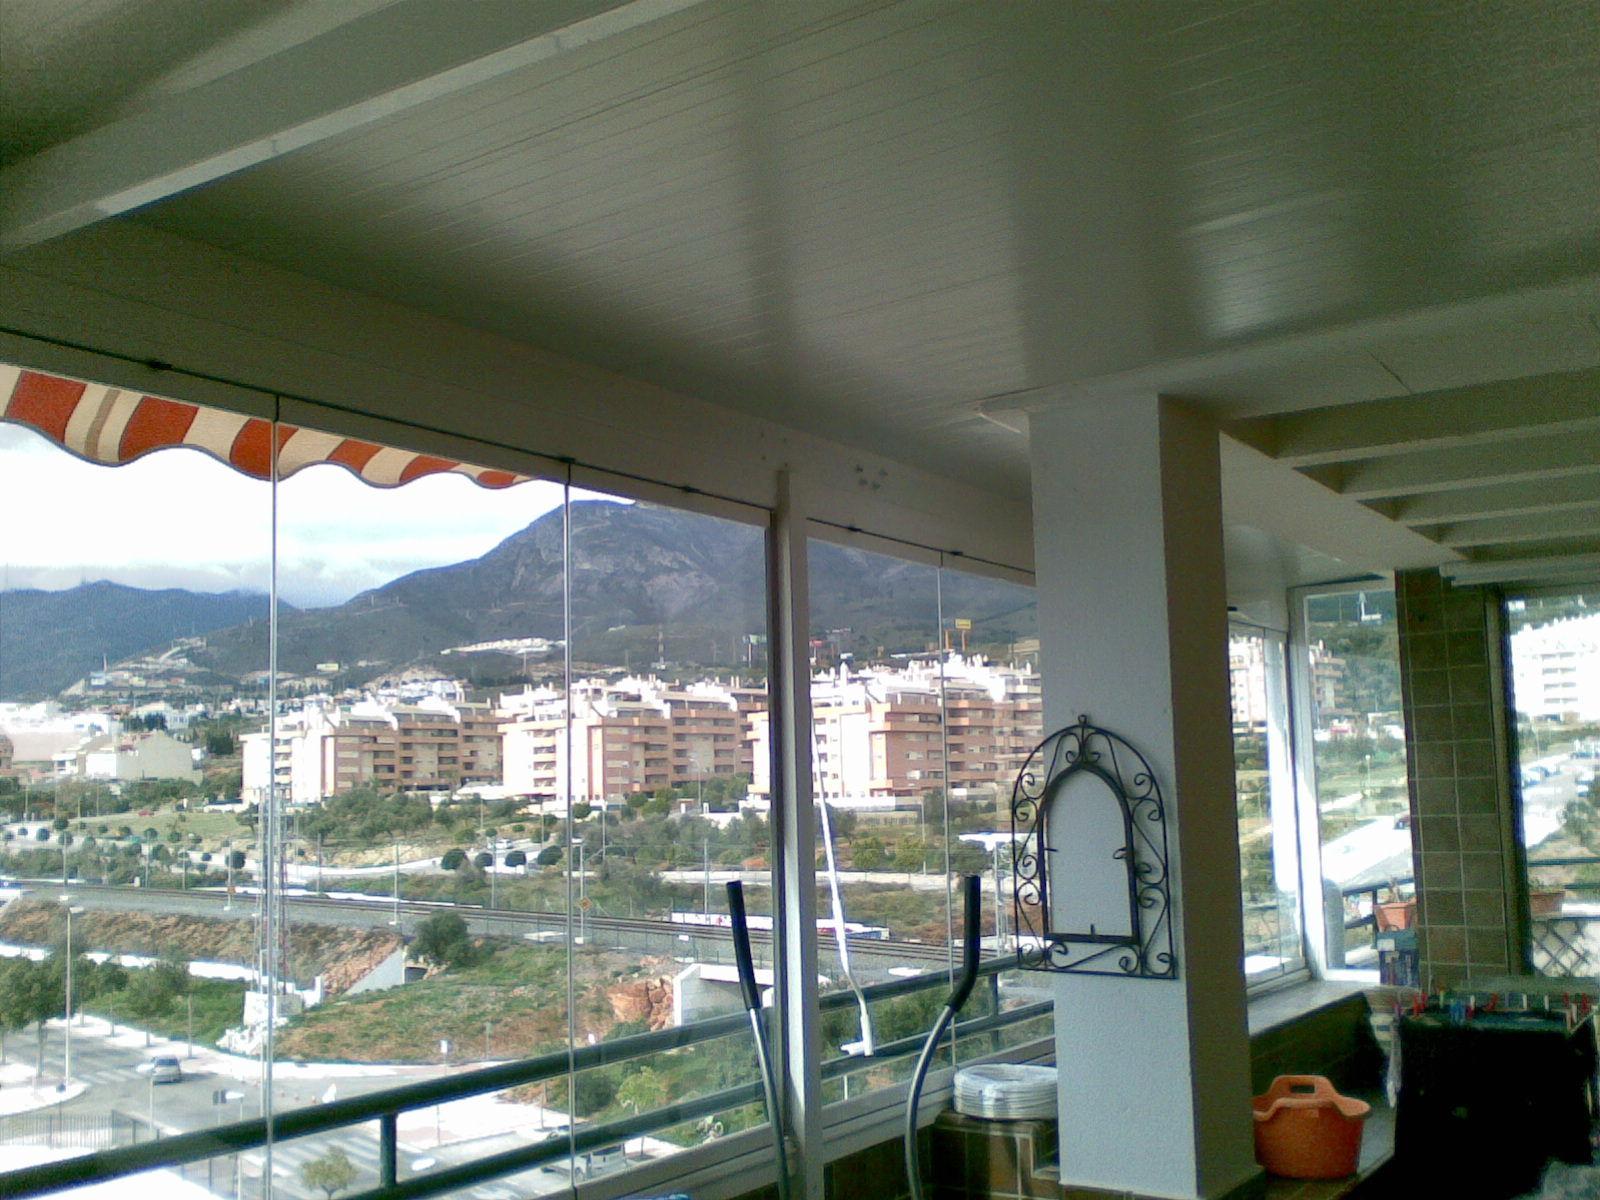 Foto 19 de Carpintería de aluminio, metálica y PVC en Málaga | Aluminios Alunoe